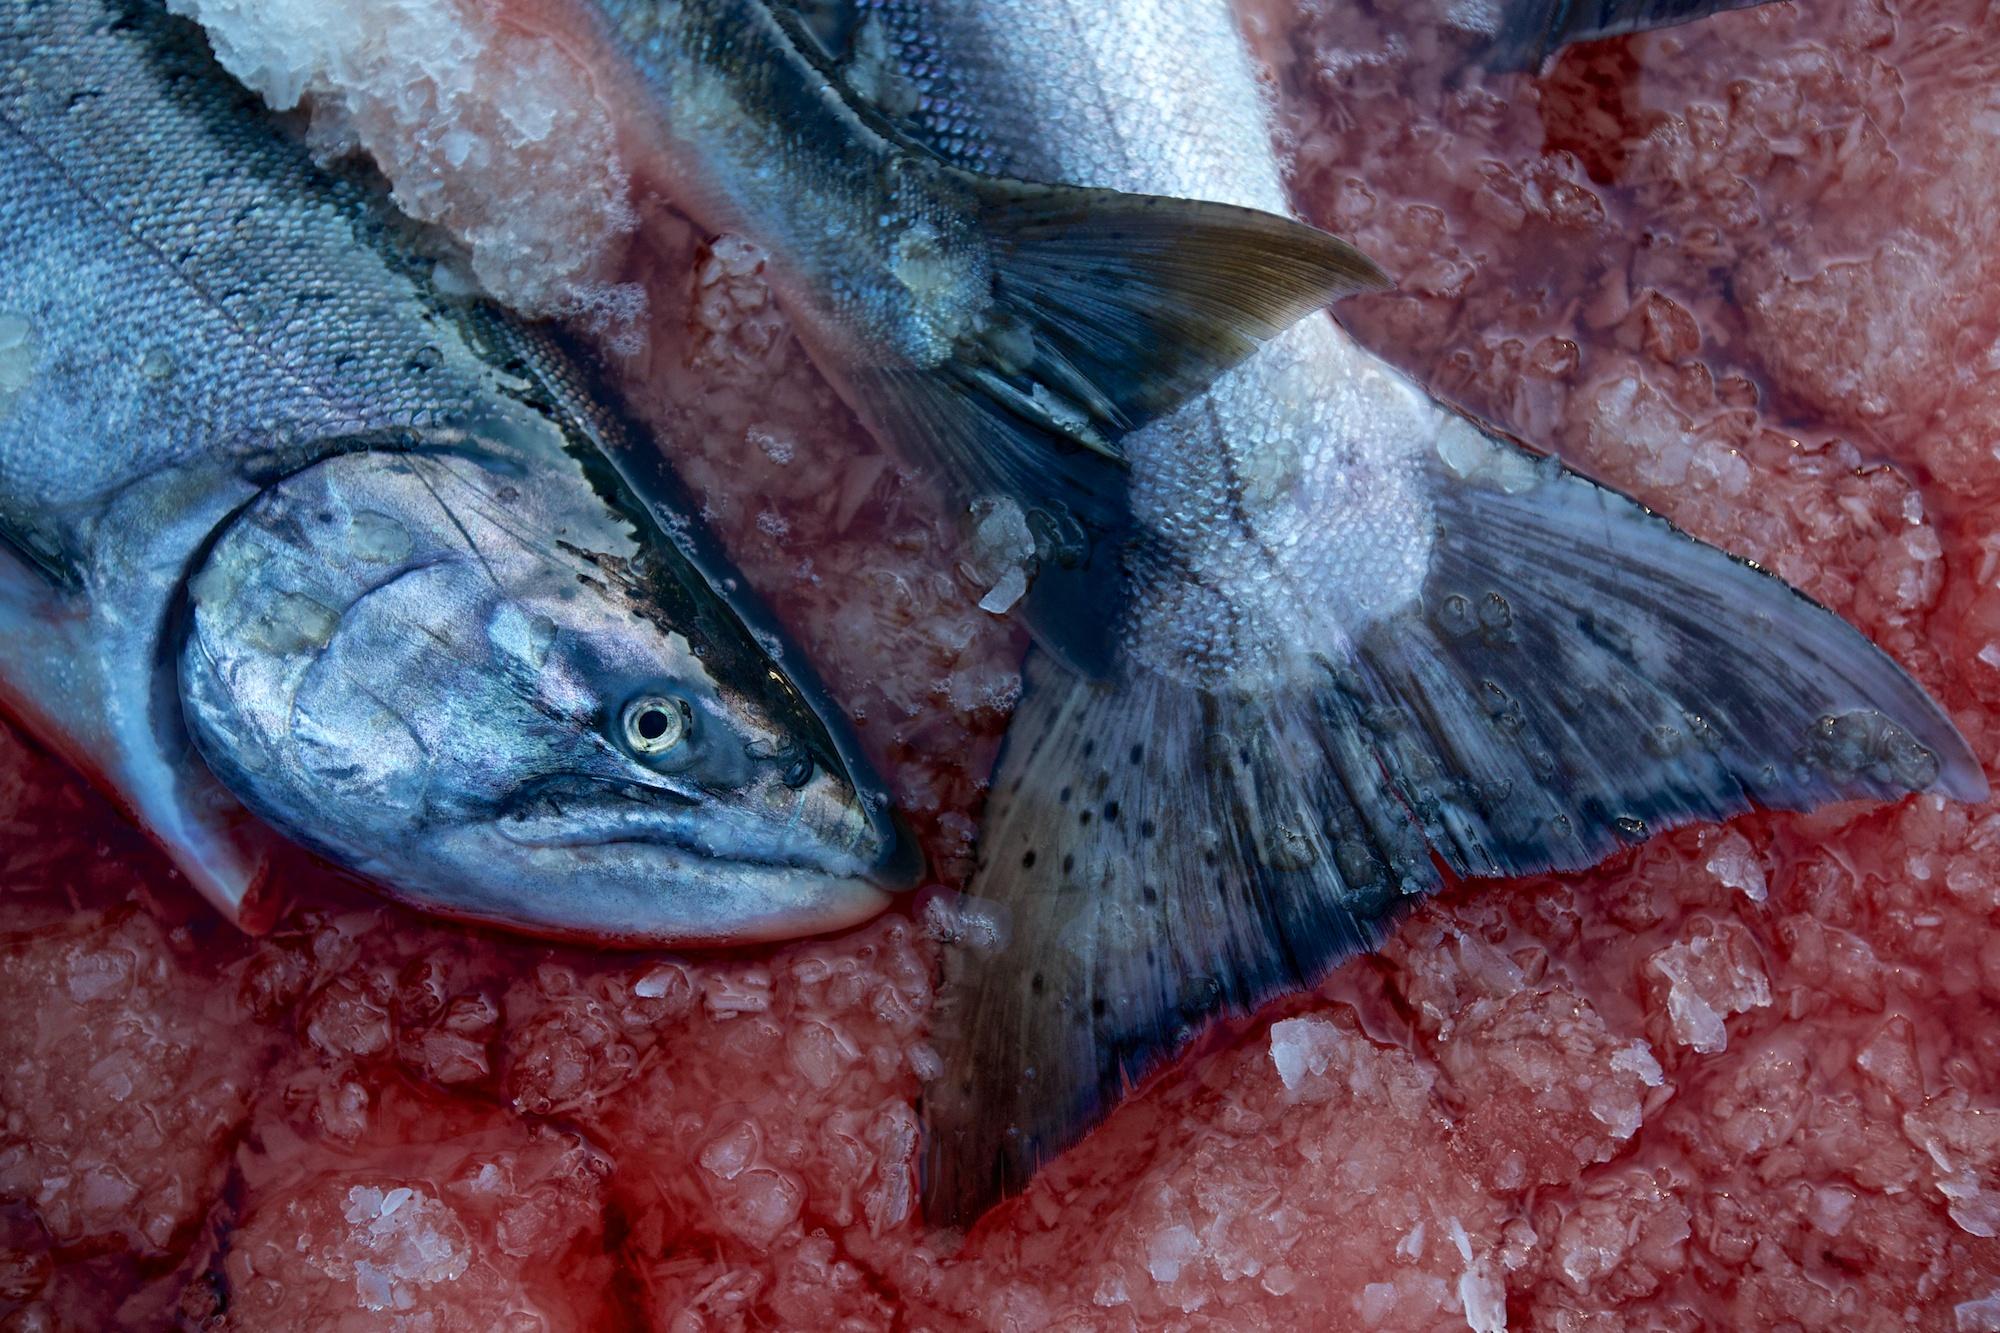 Iced chinook salmon.  Thomas Boyd/The Oregonian